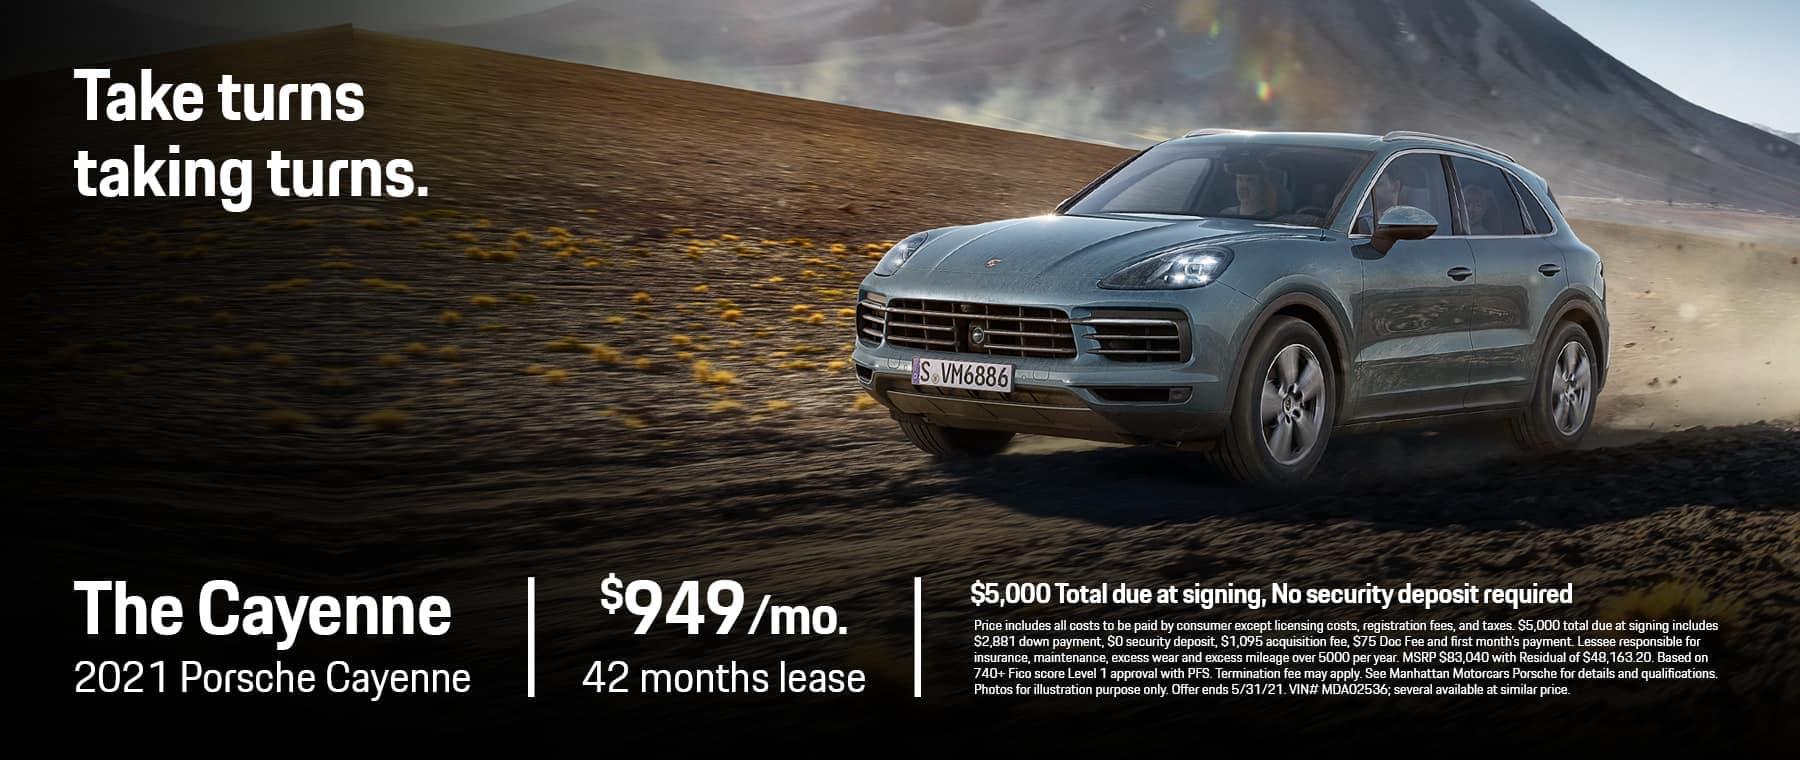 MMC-Porsche-1800×760-MAY-2021-Cayenne-optim